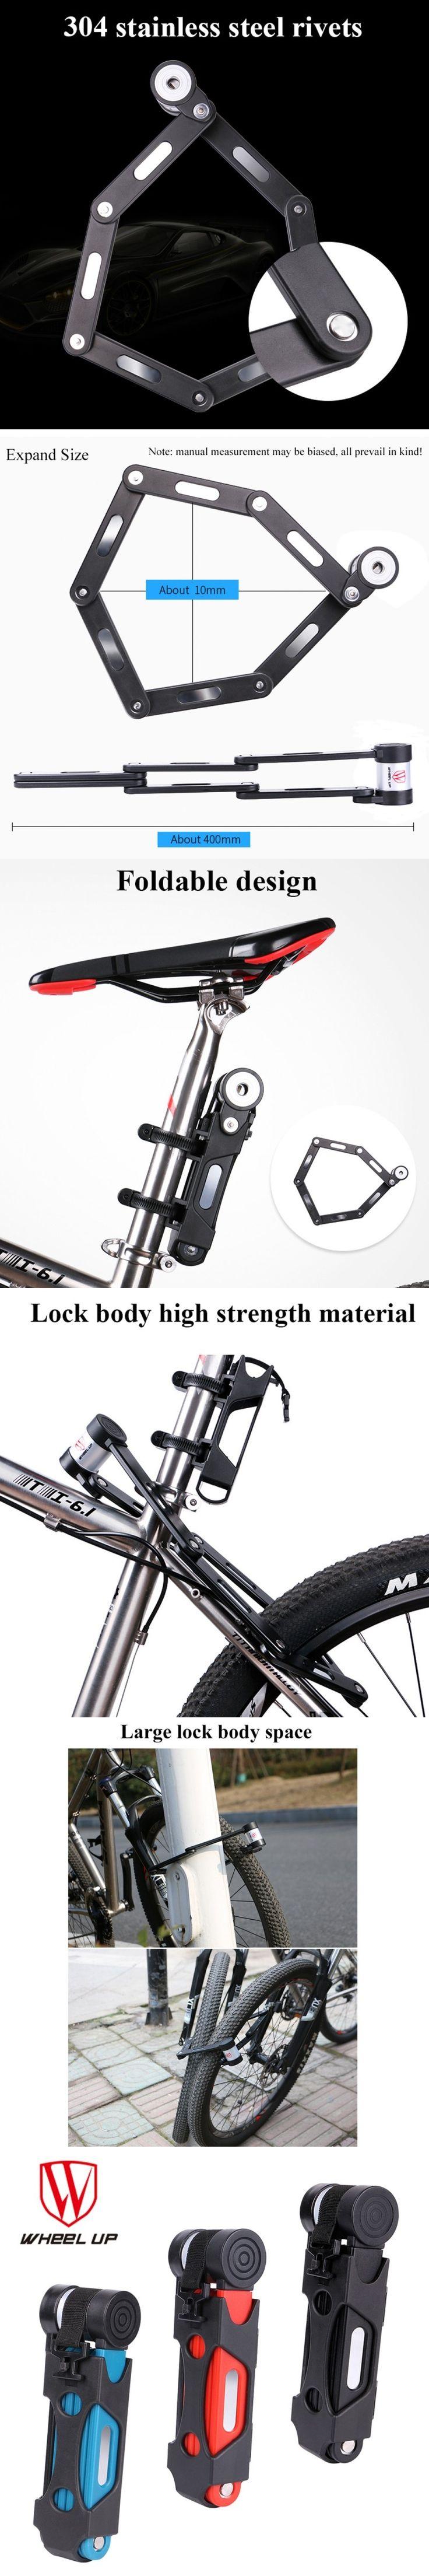 WHEEL UP  3 colors Anti-cut Safety MTB Folding Bike Lock Professional Anti-theft Alloy Steel Foldable Bicycle Lock Keys Password